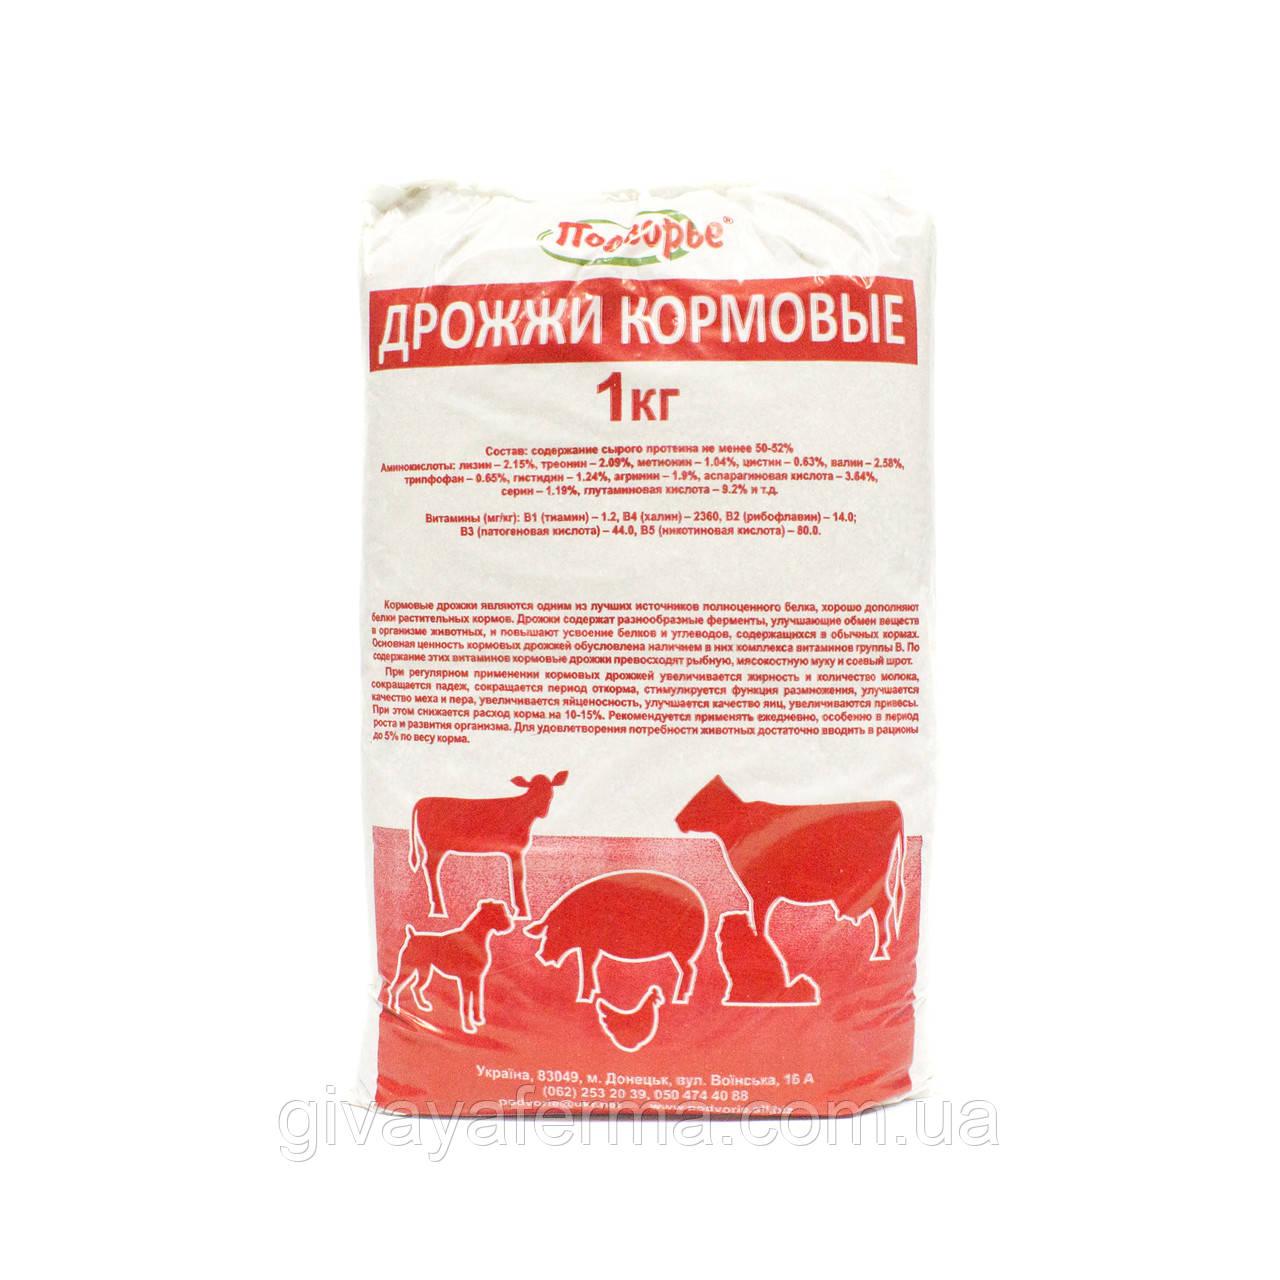 Дрожжи кормовые Протеин 39%, 1 кг, белково-витаминная добавка (для животных и птиц)